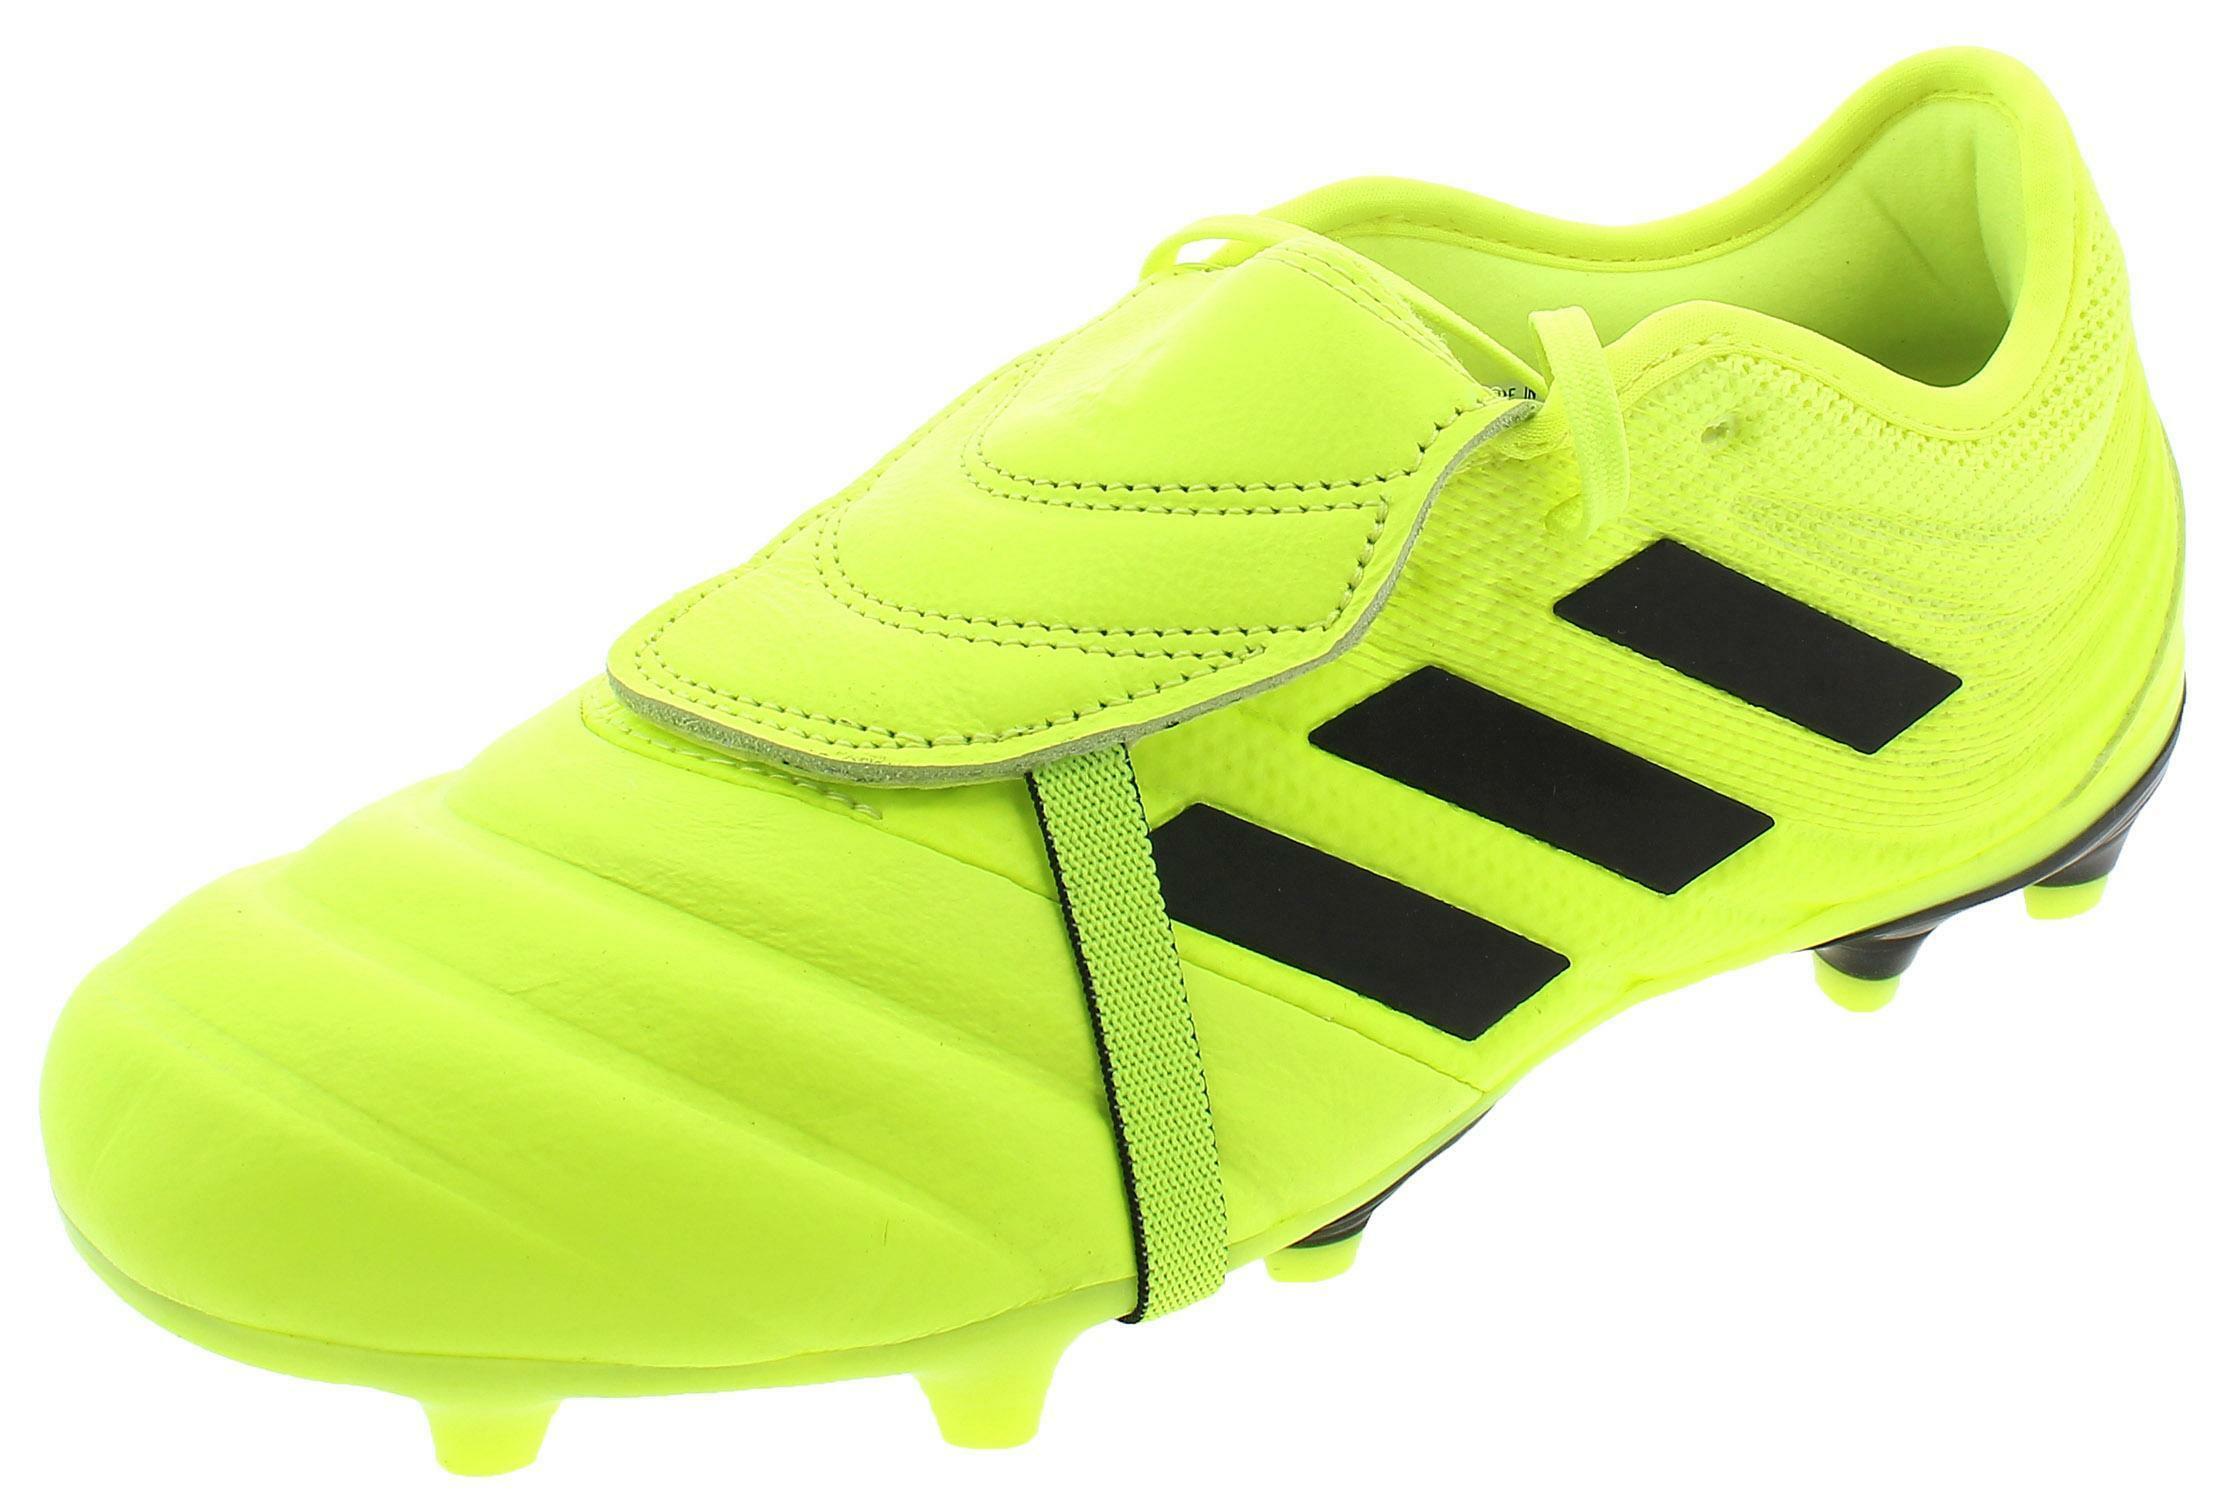 adidas adidas copa gloro 19.2 fg scarpini calcio uomo gialli f35491